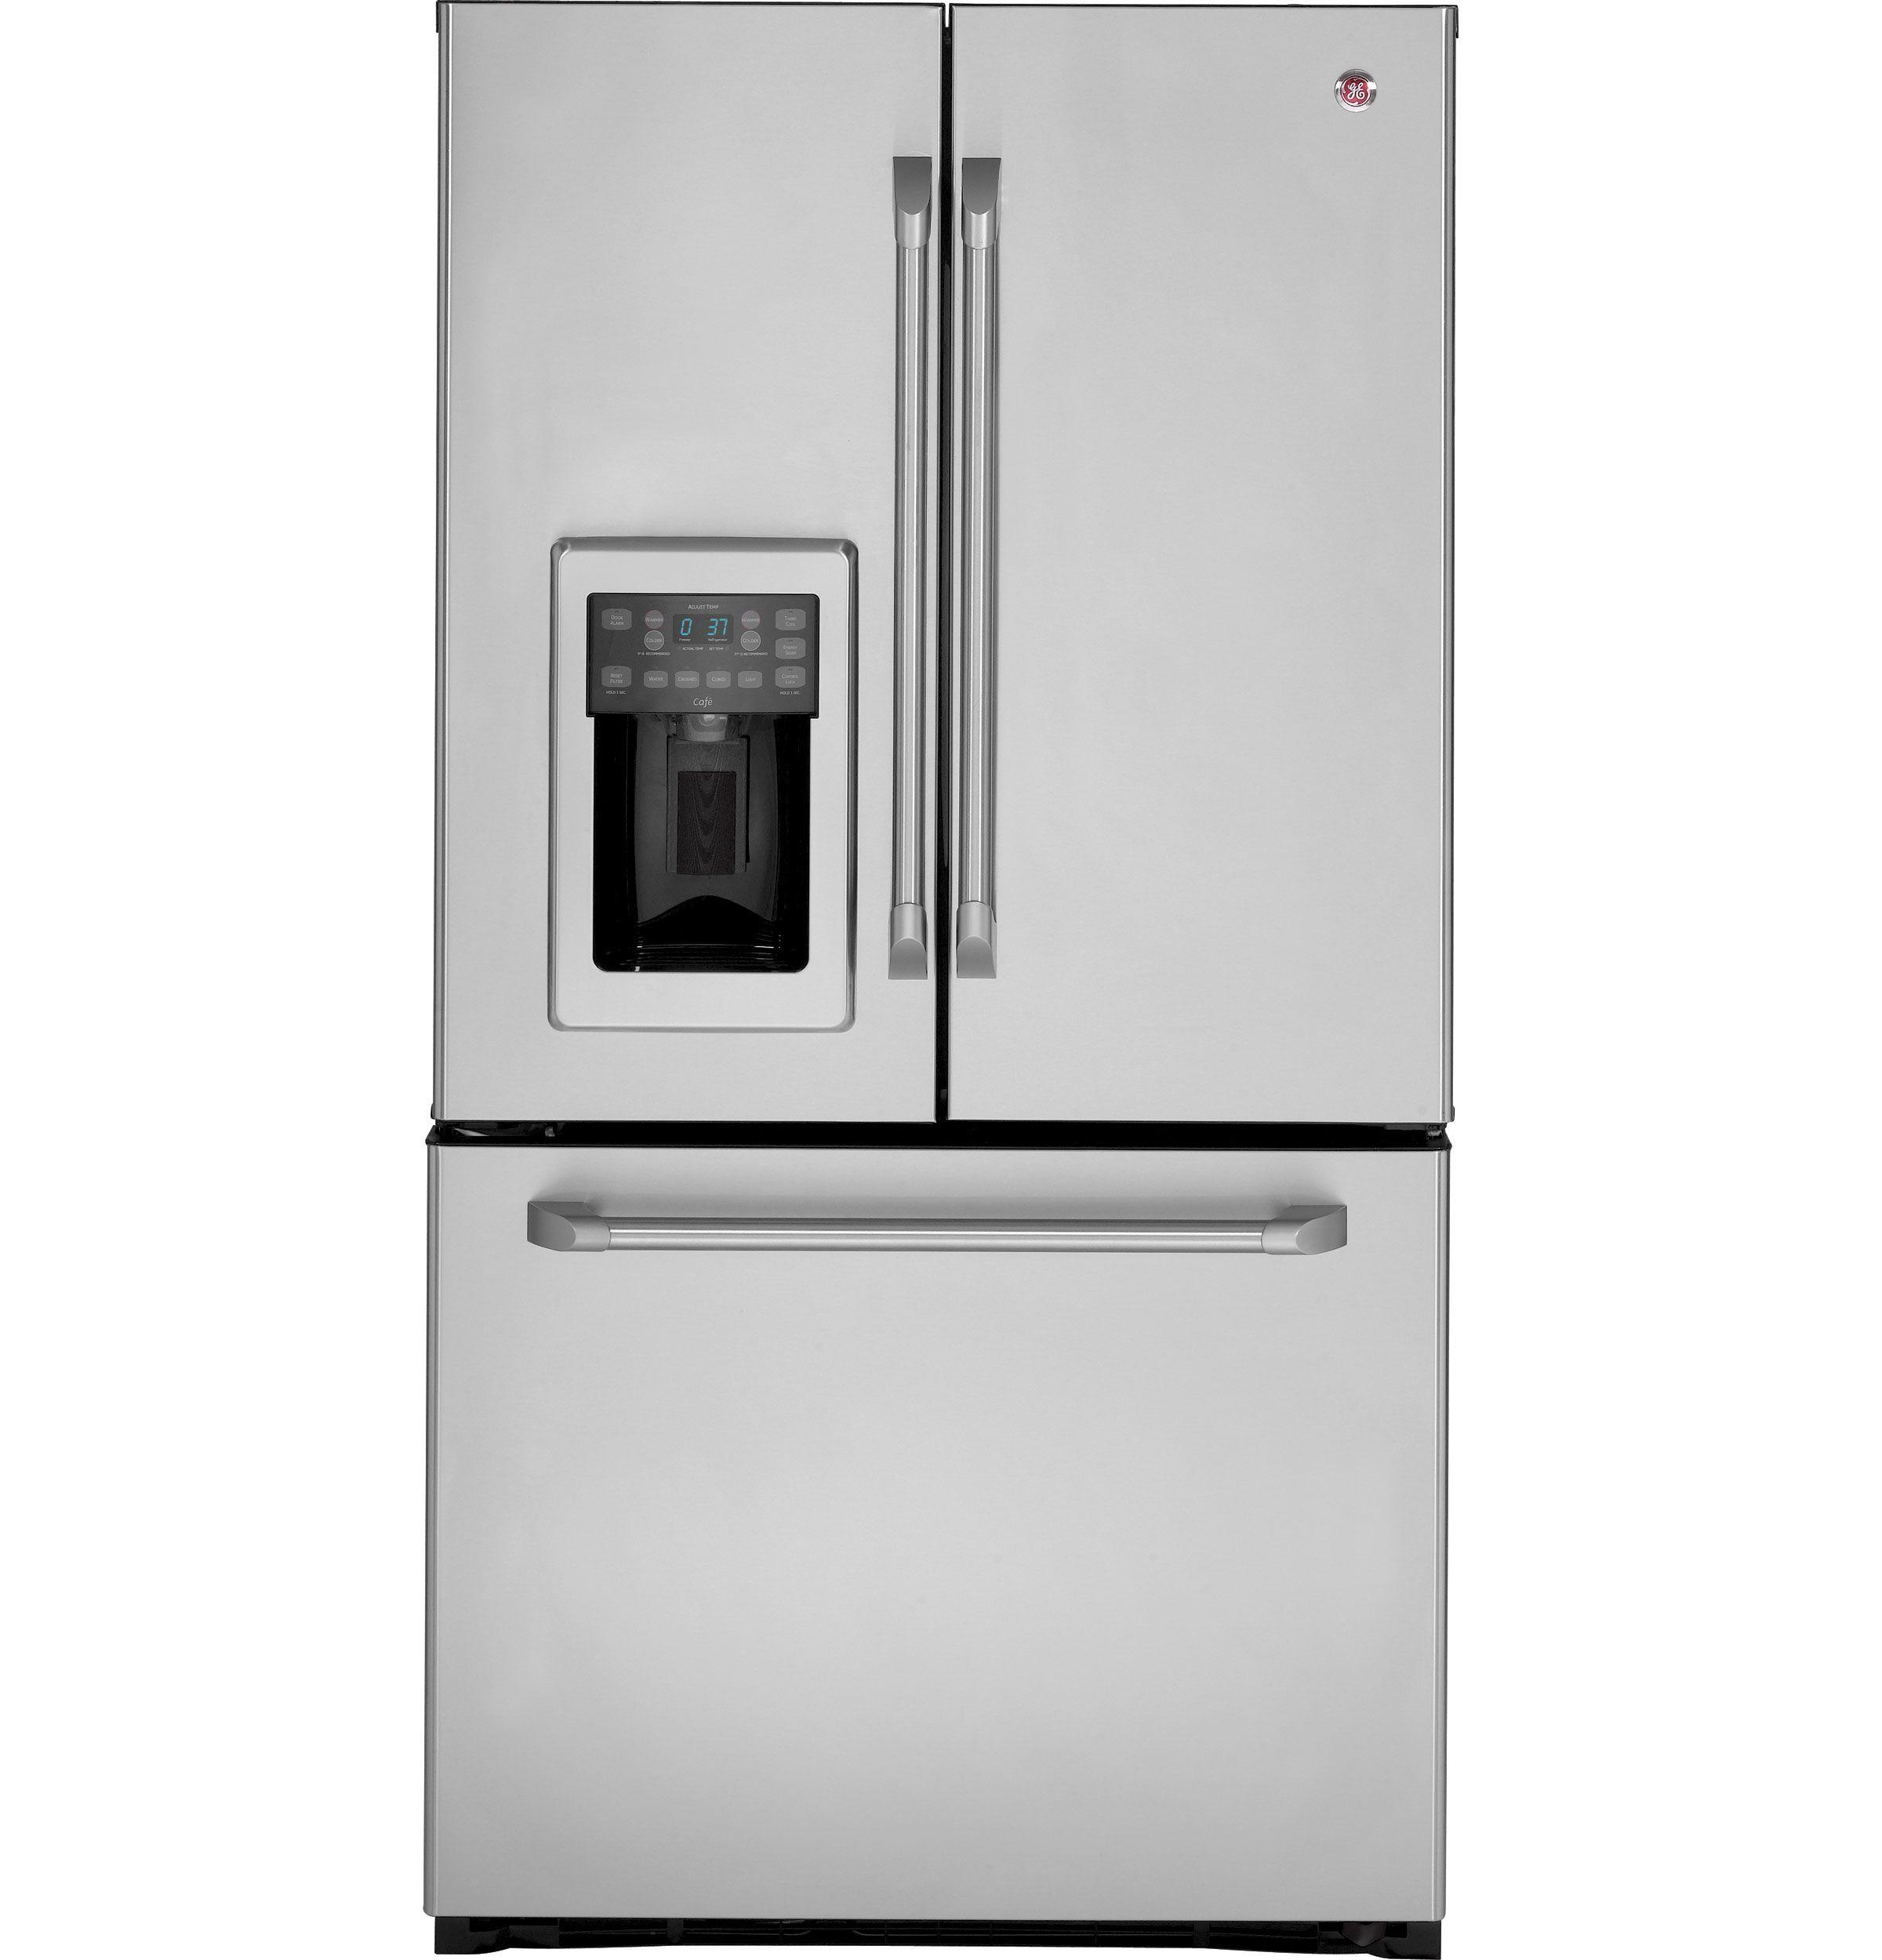 GE Café™ Series ENERGY STAR® 25.1 Cu. Ft. French Door Refrigerator |  CFSP5RKBSS. French Door RefrigeratorCounter Depth ...